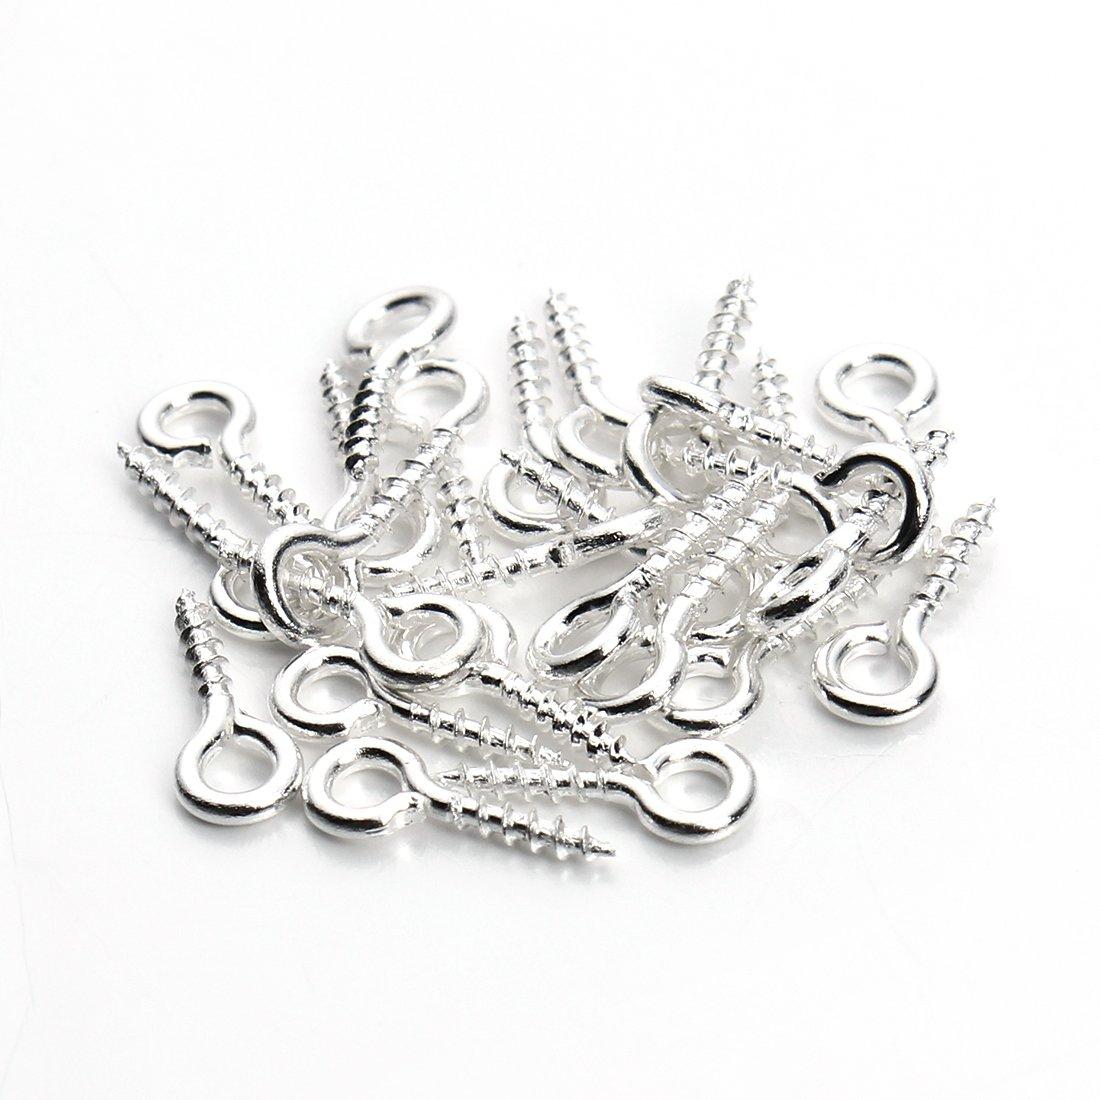 Linsoir Beads 200pcs Sturdy Metal Tiny Screw Eyes Pin Bail Peg Antique Bronze Tone 5X12mm